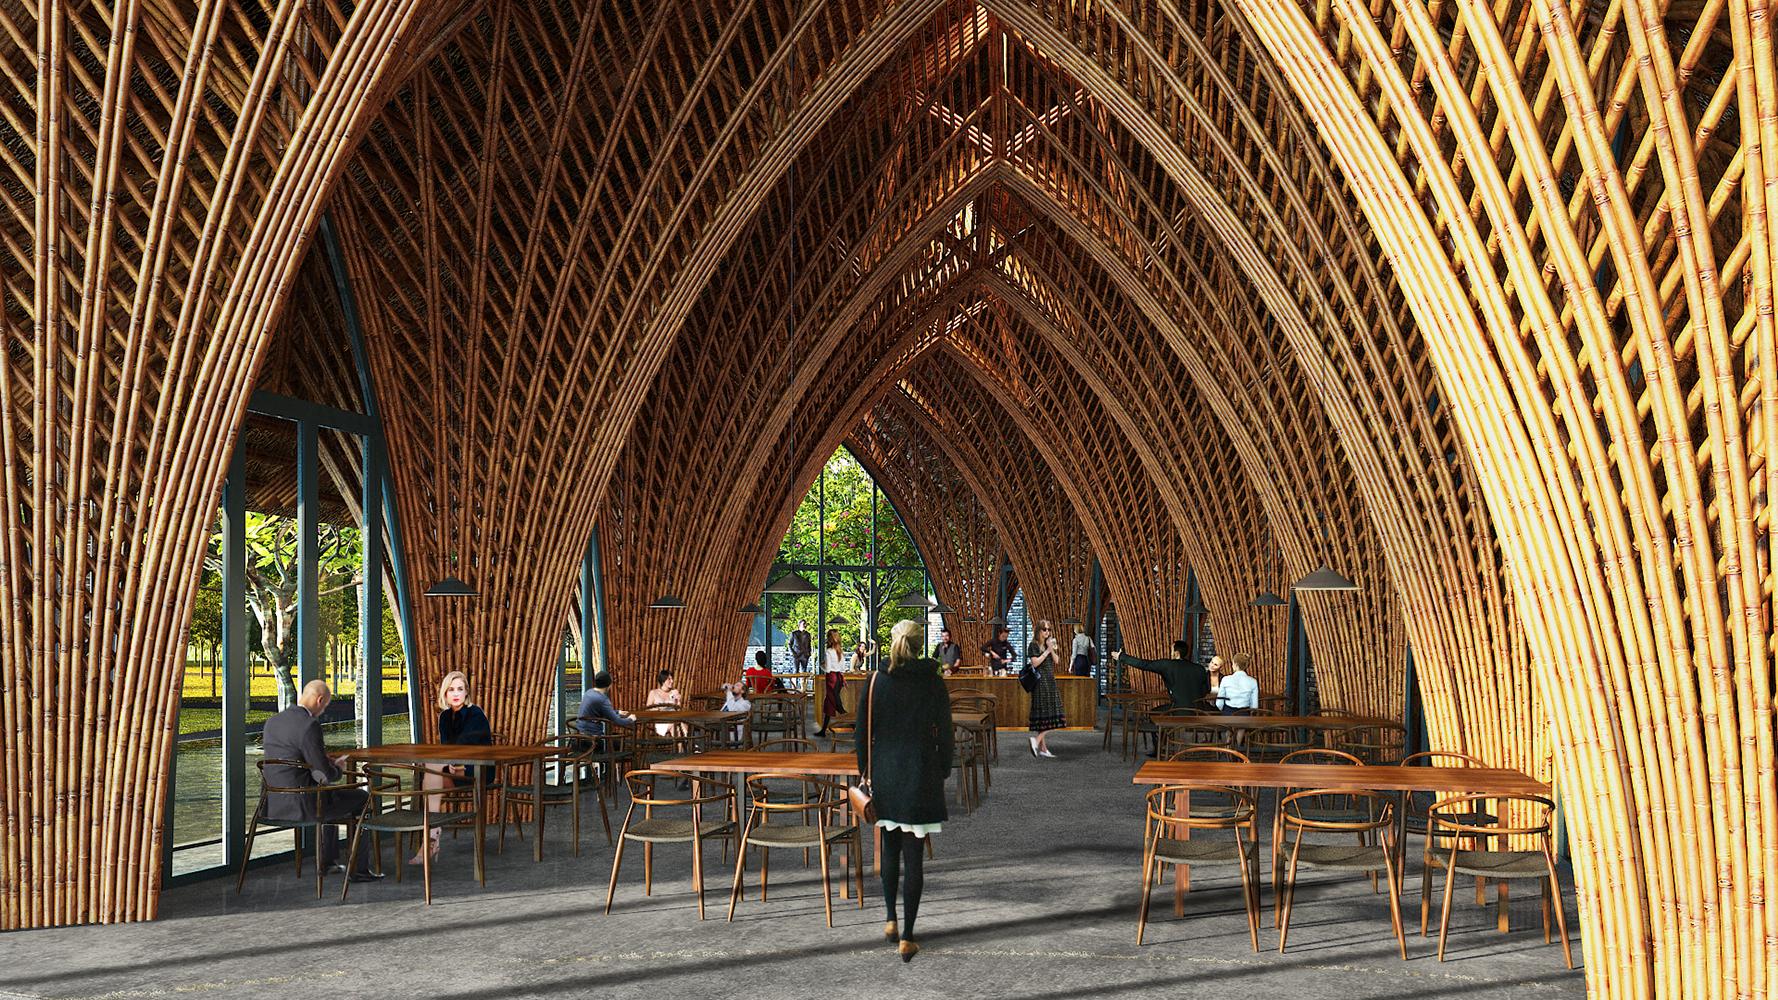 Gallery Of Vtn Architects Creates Airtight Bamboo Pavilion